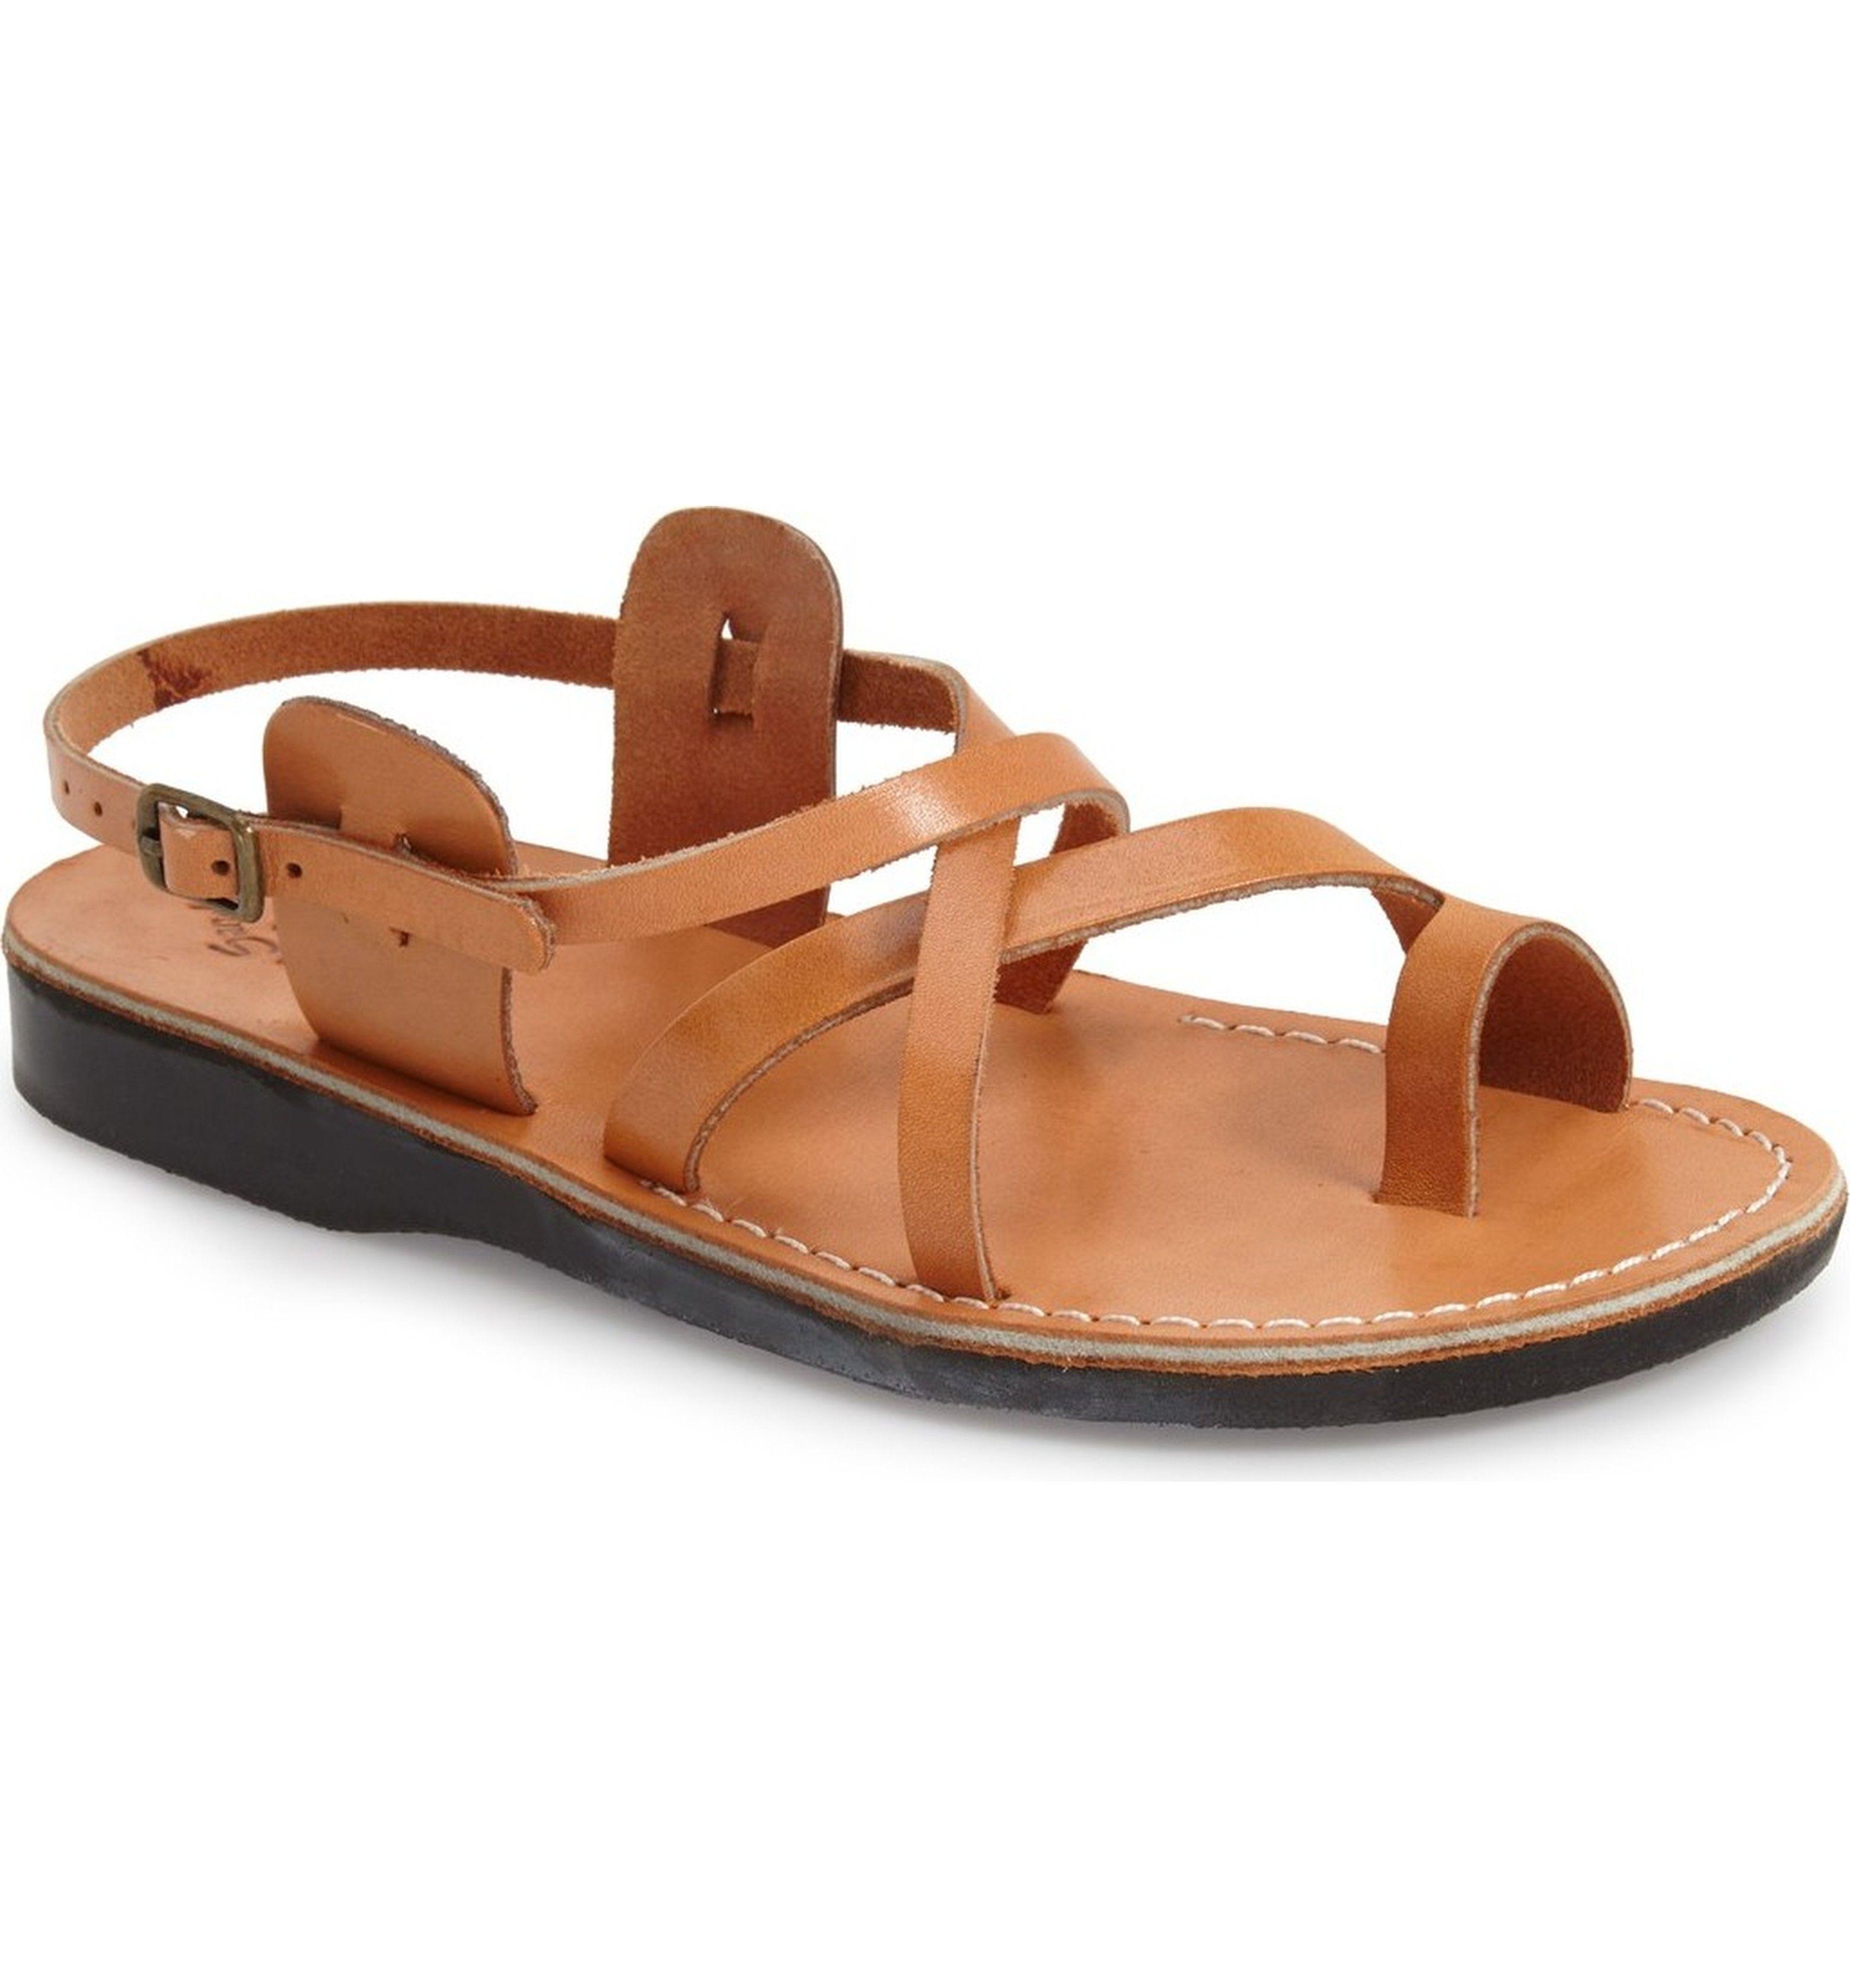 Buy Cheap The Good Shepherd' Leather Sandal Men Mens Tan Leather Jerusalem Sandals Mens Shoes